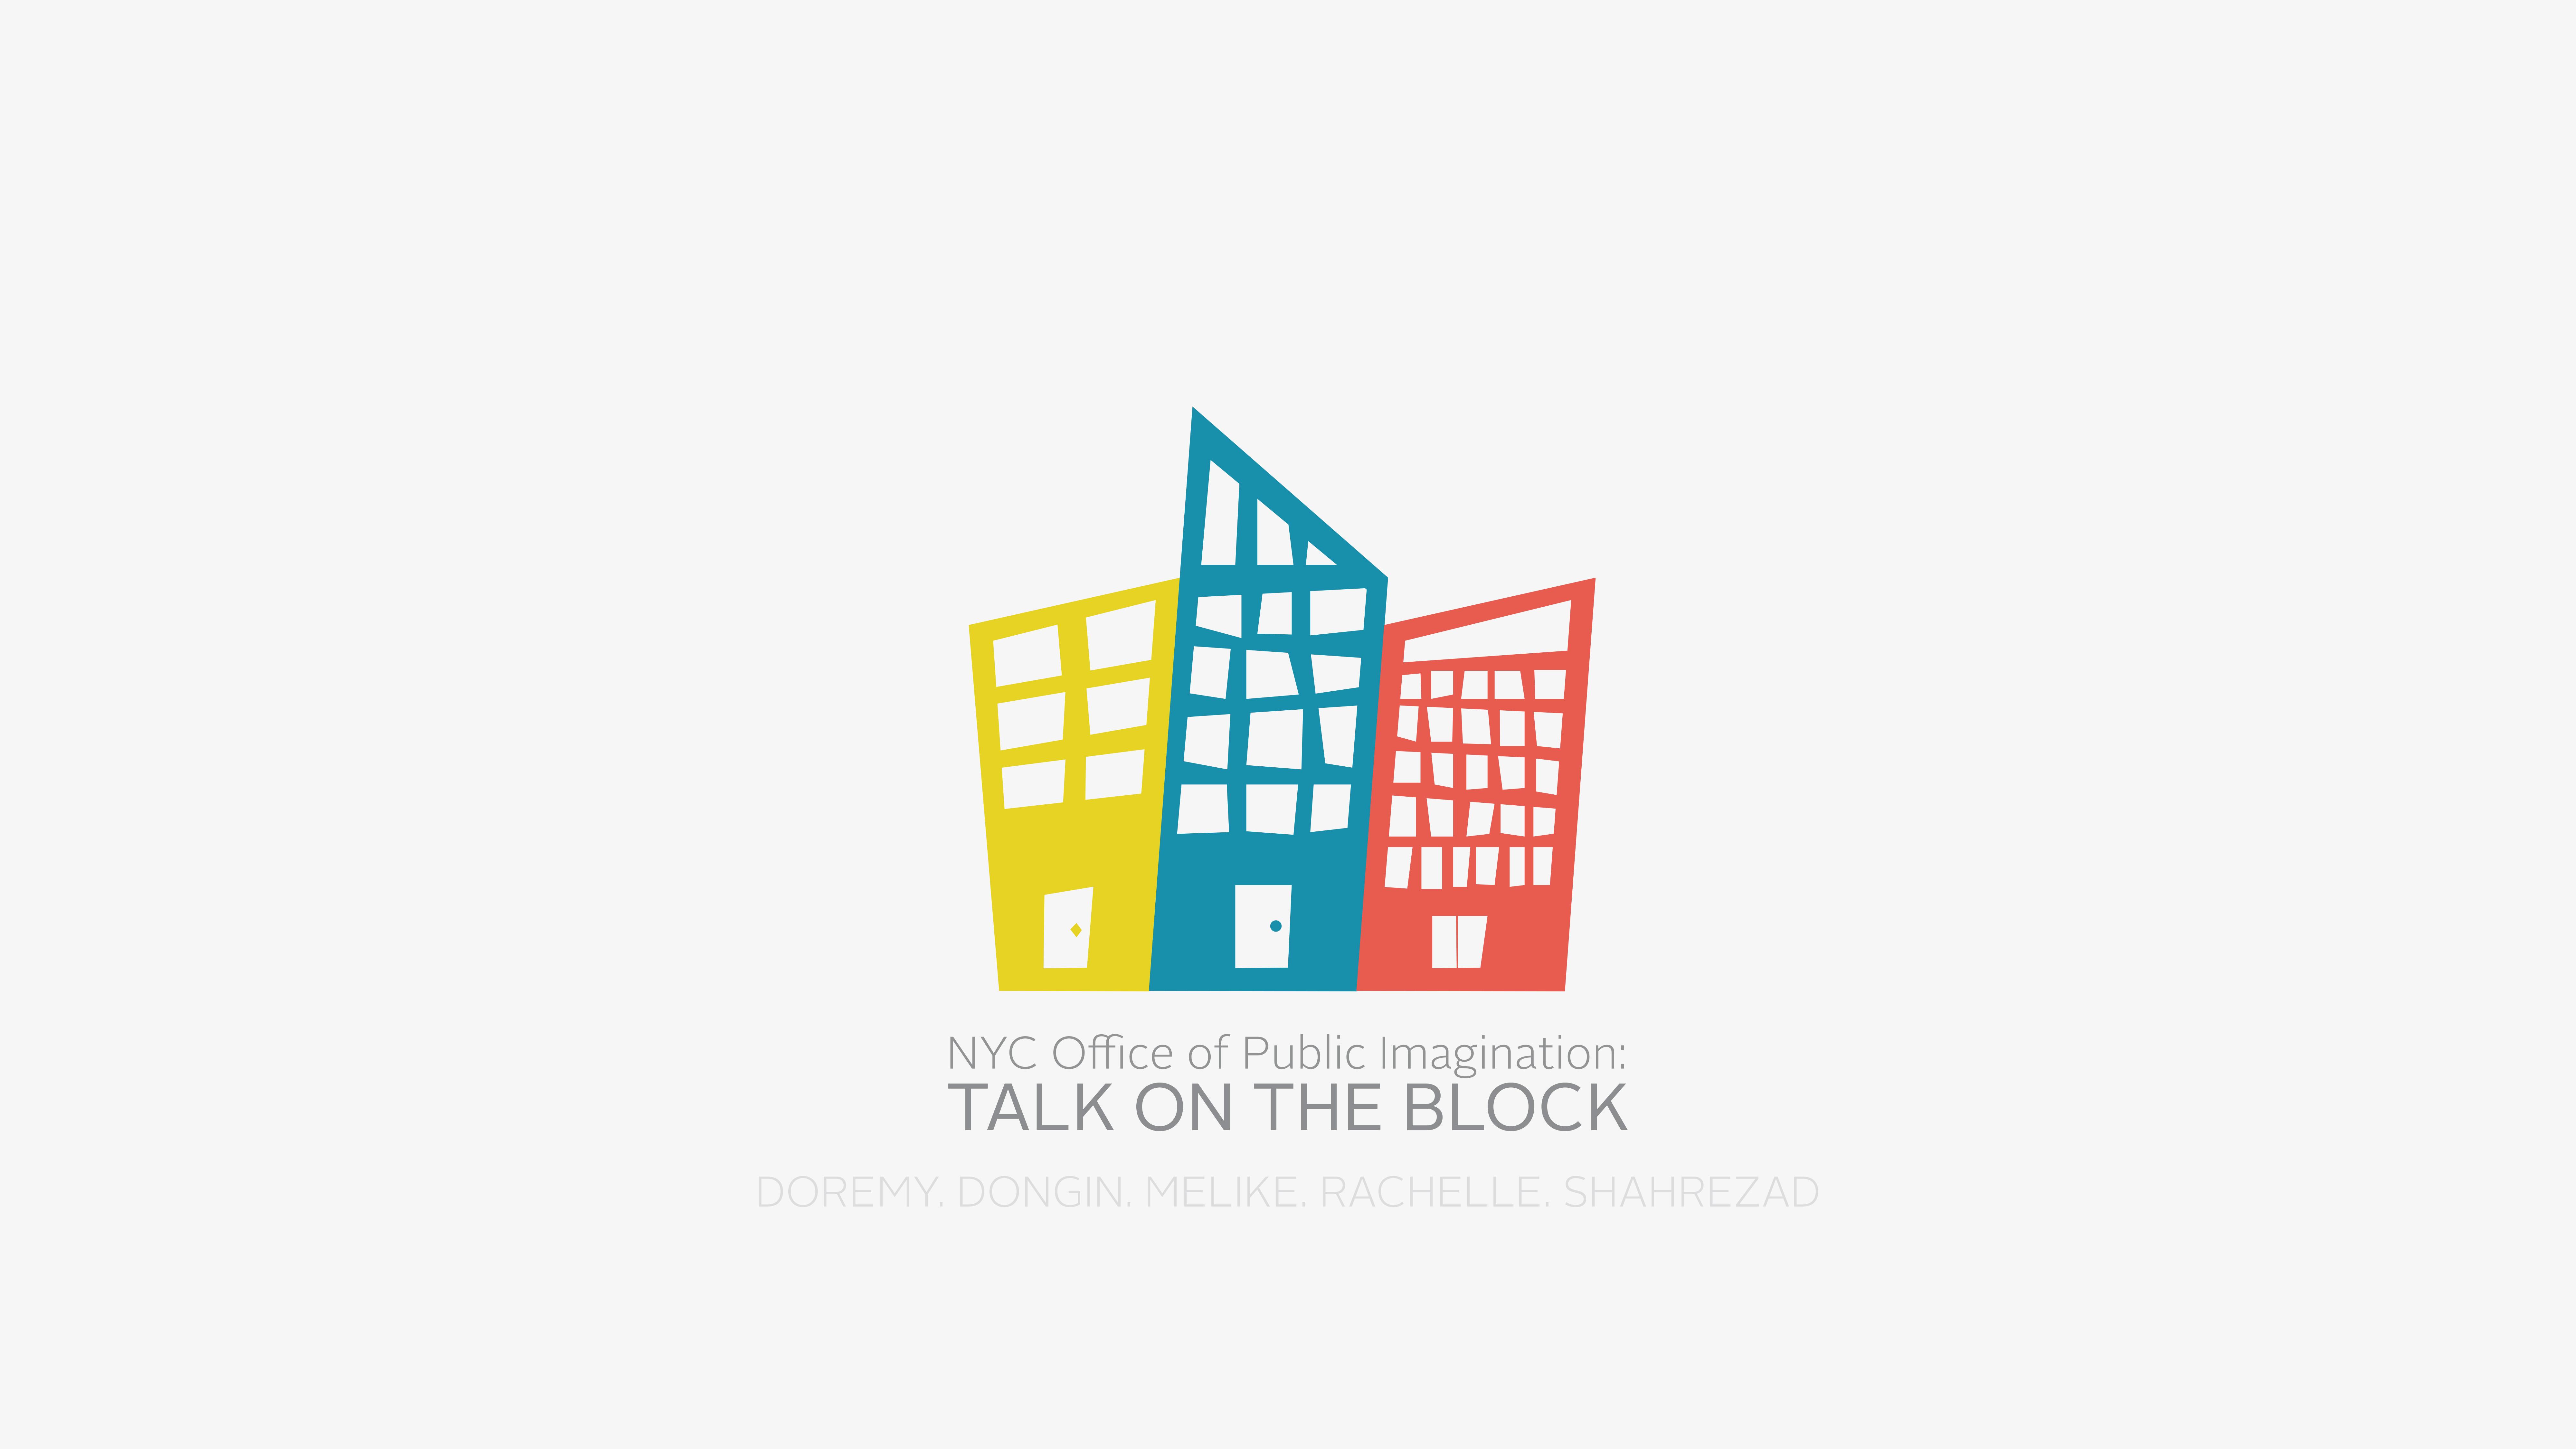 NYC Office of Public Imagination | School of Design Strategies